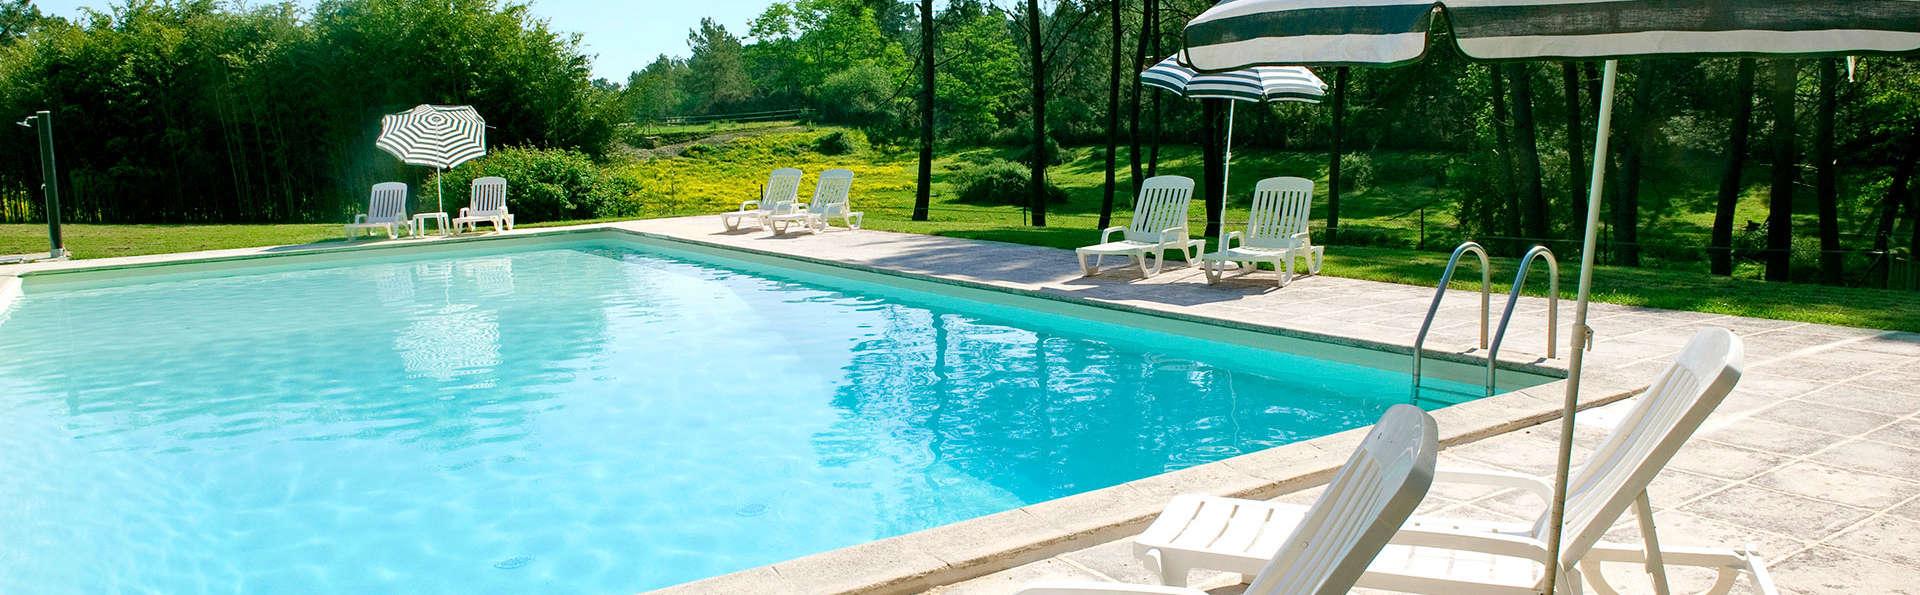 Manoir du Grand Vignoble - edit_pool.jpg